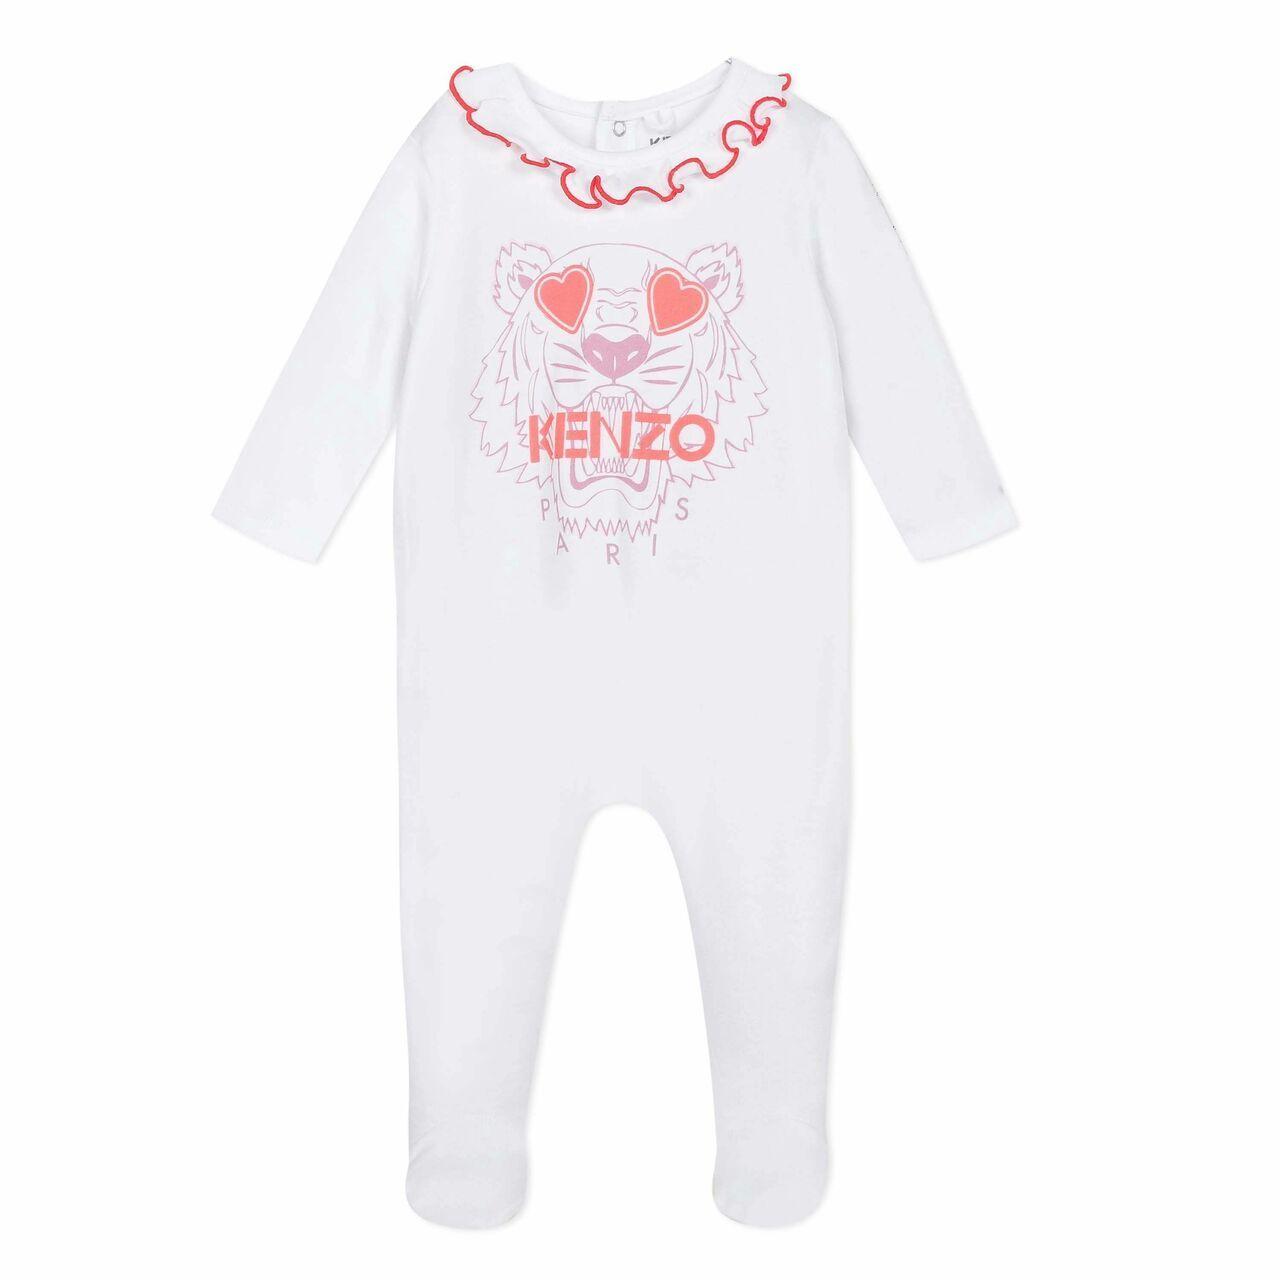 KQ54013 / 01 OPTIC WHITE / KENZO TIGER PLAYWEAR